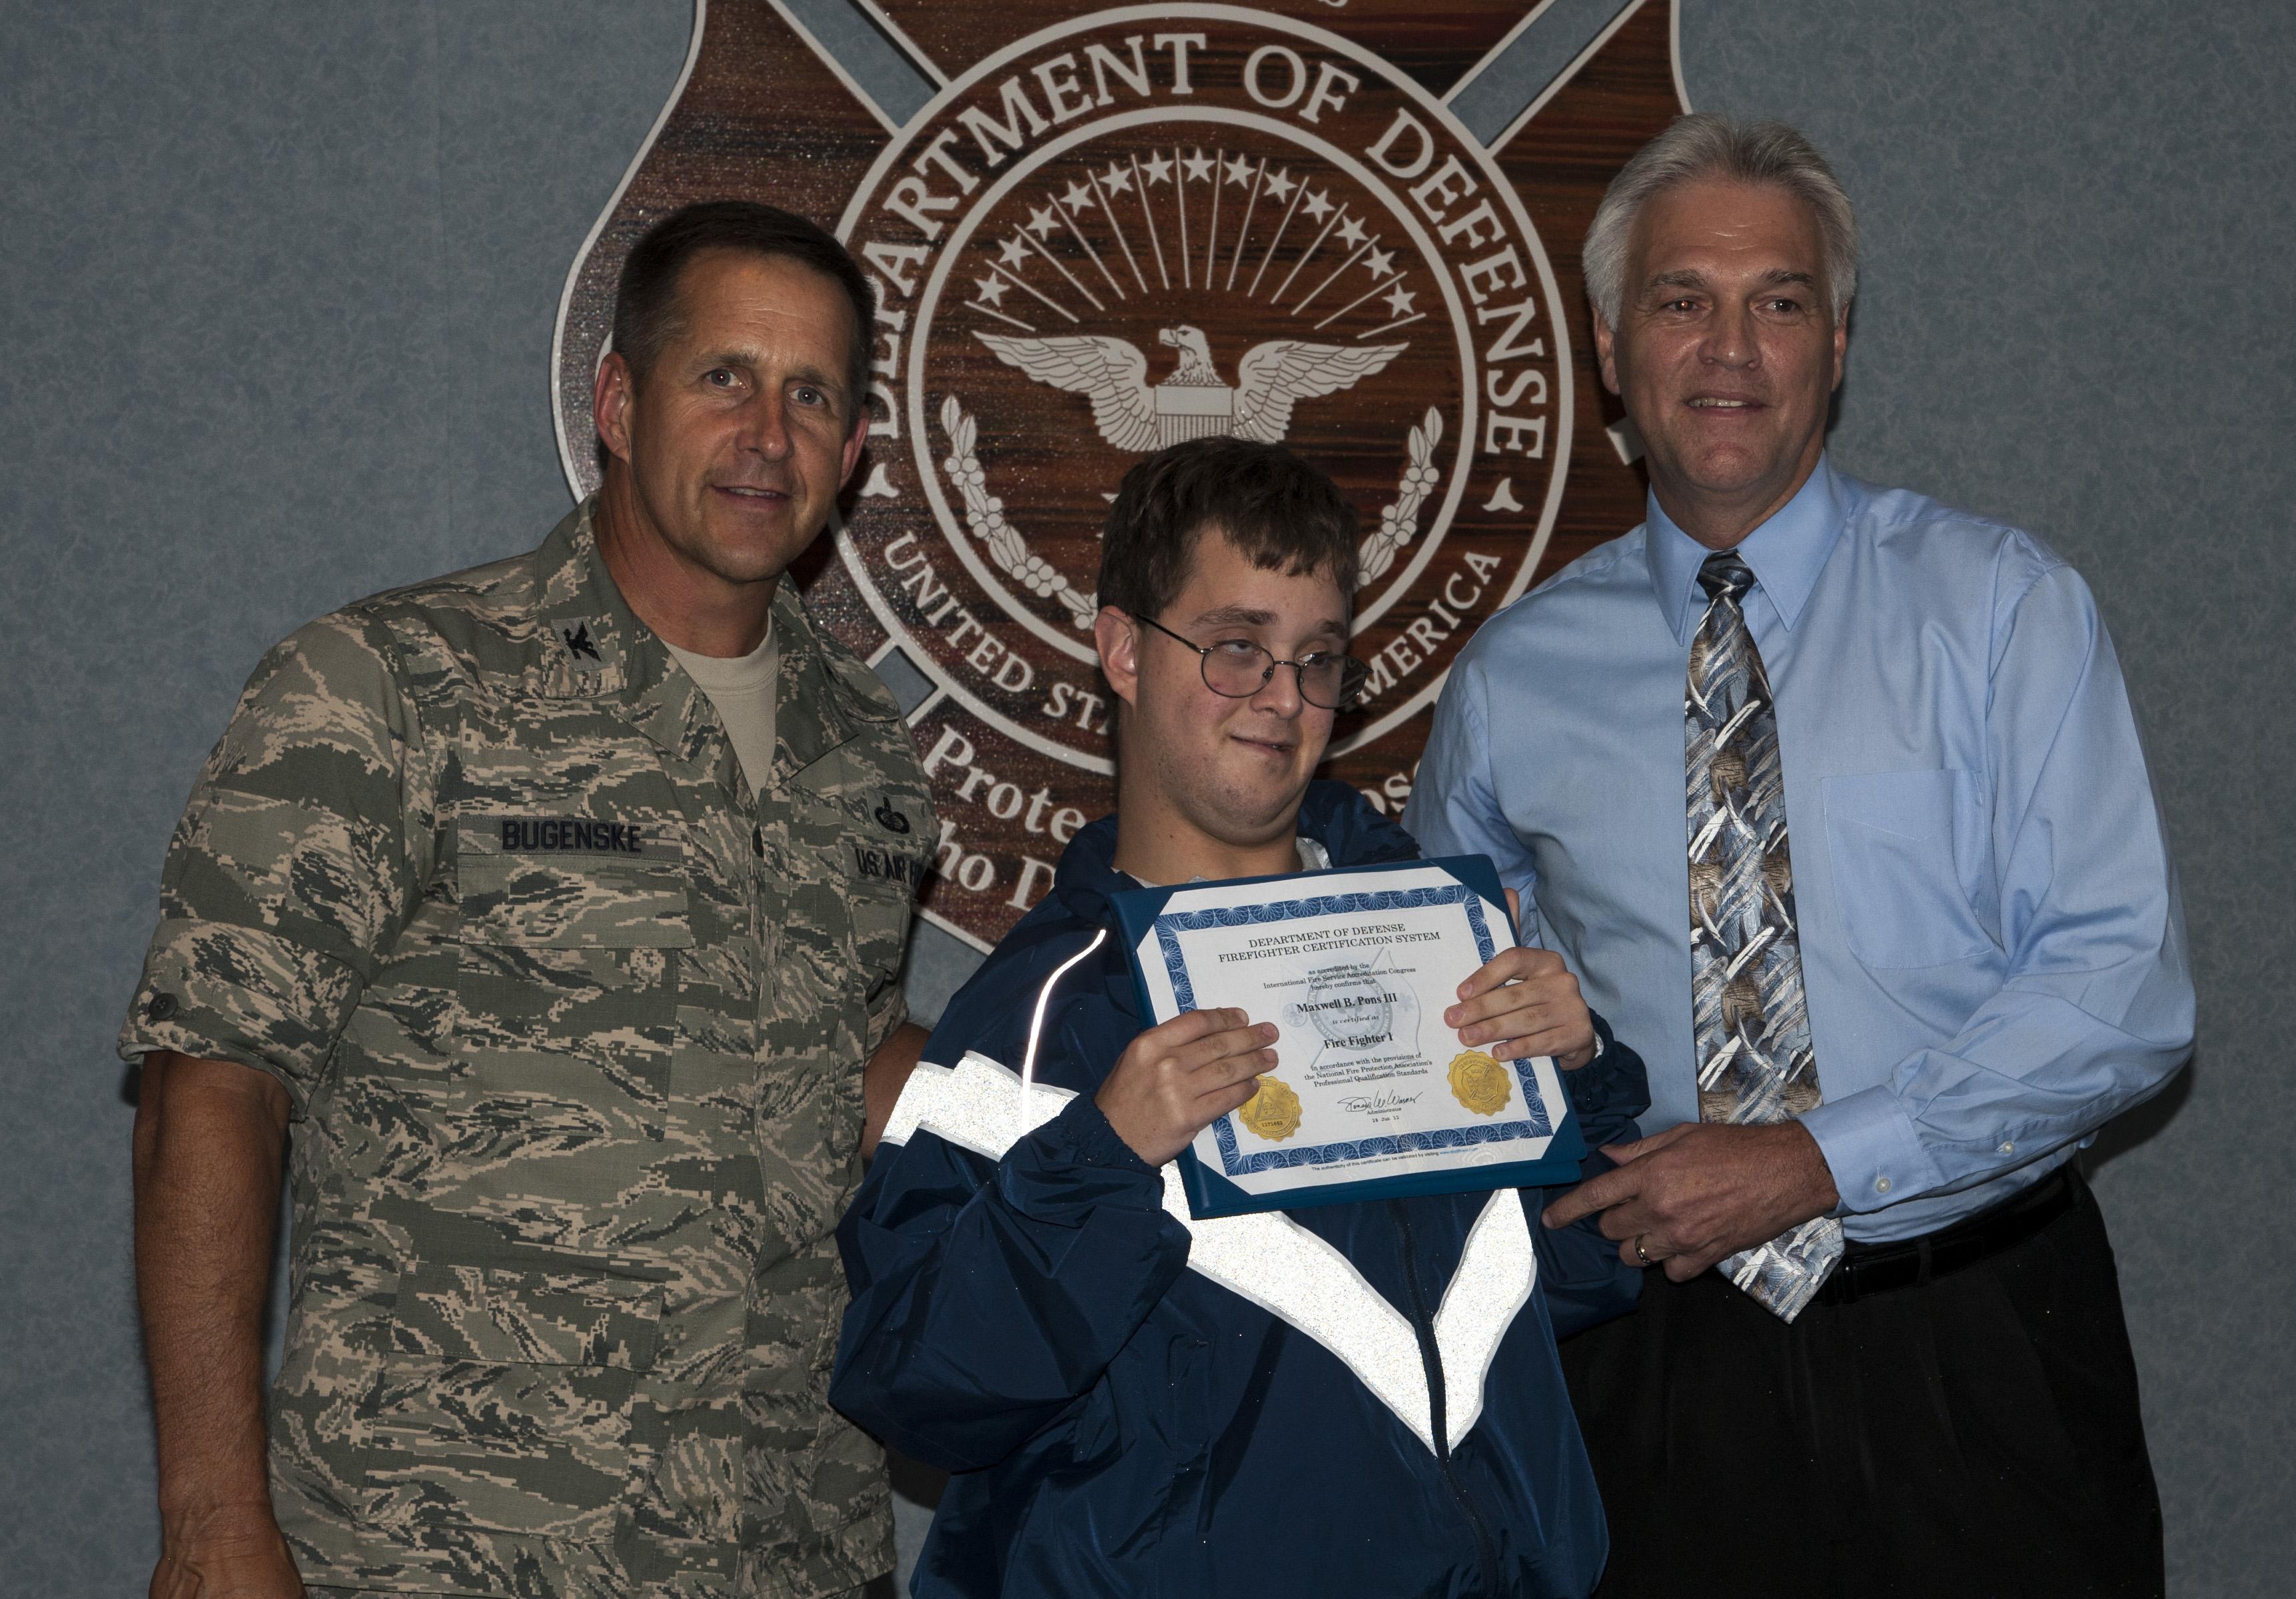 goodfellow helps teen s firefighter dream come true > goodfellow goodfellow helps teen s firefighter dream come true